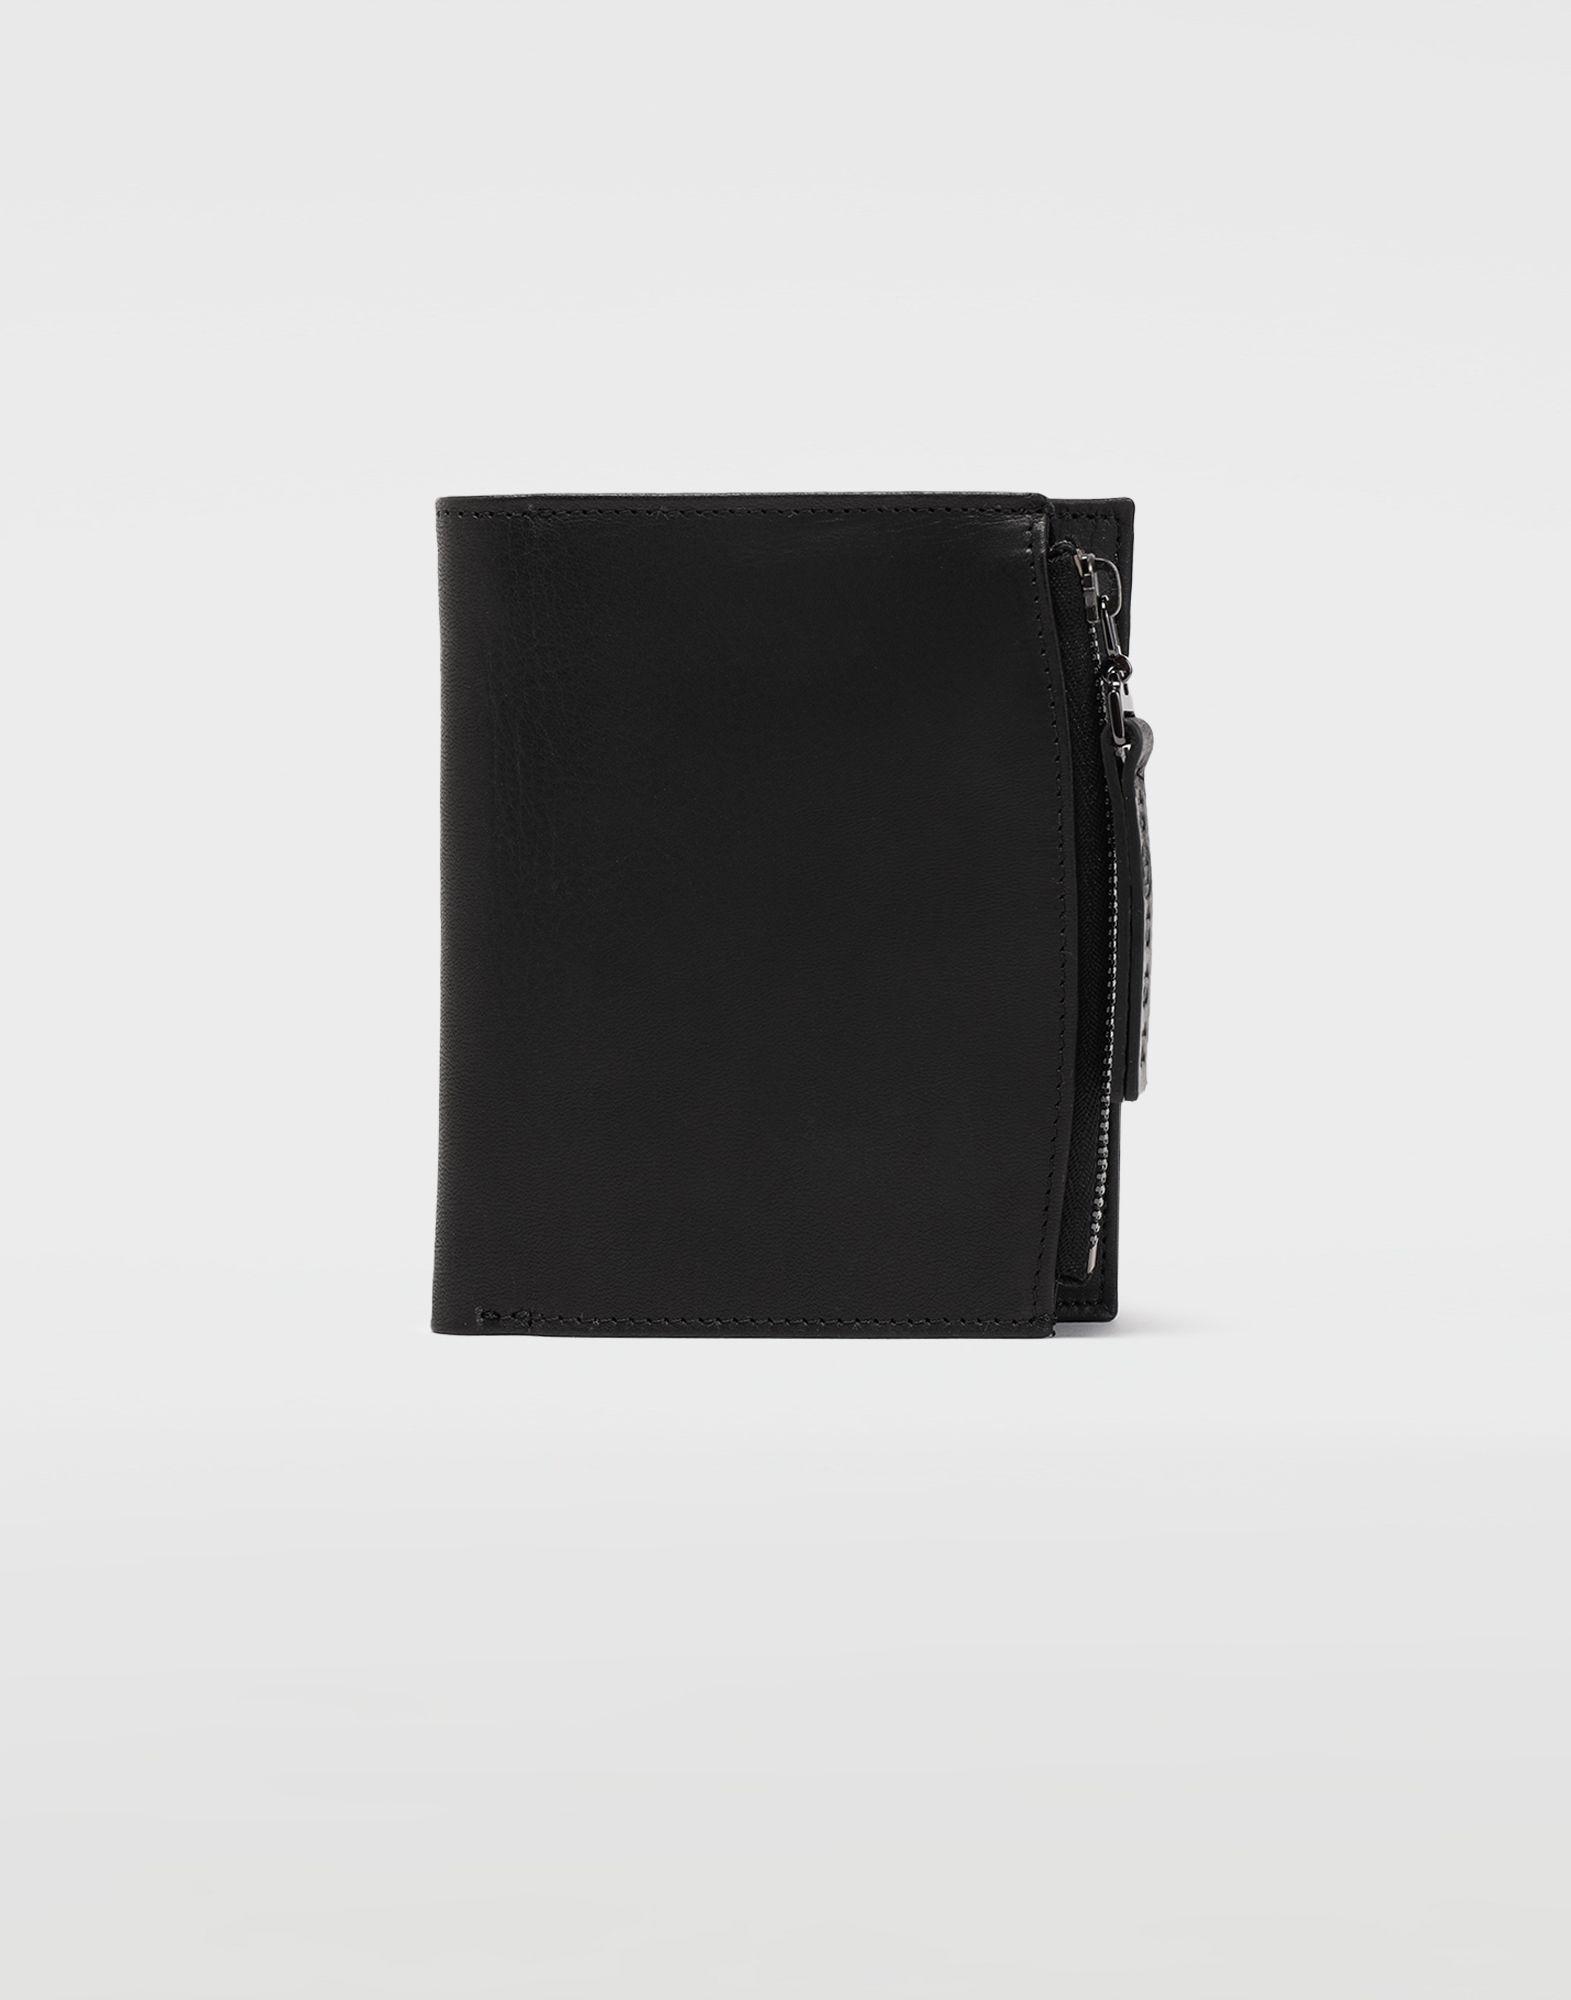 MAISON MARGIELA Large leather wallet Wallets Man f